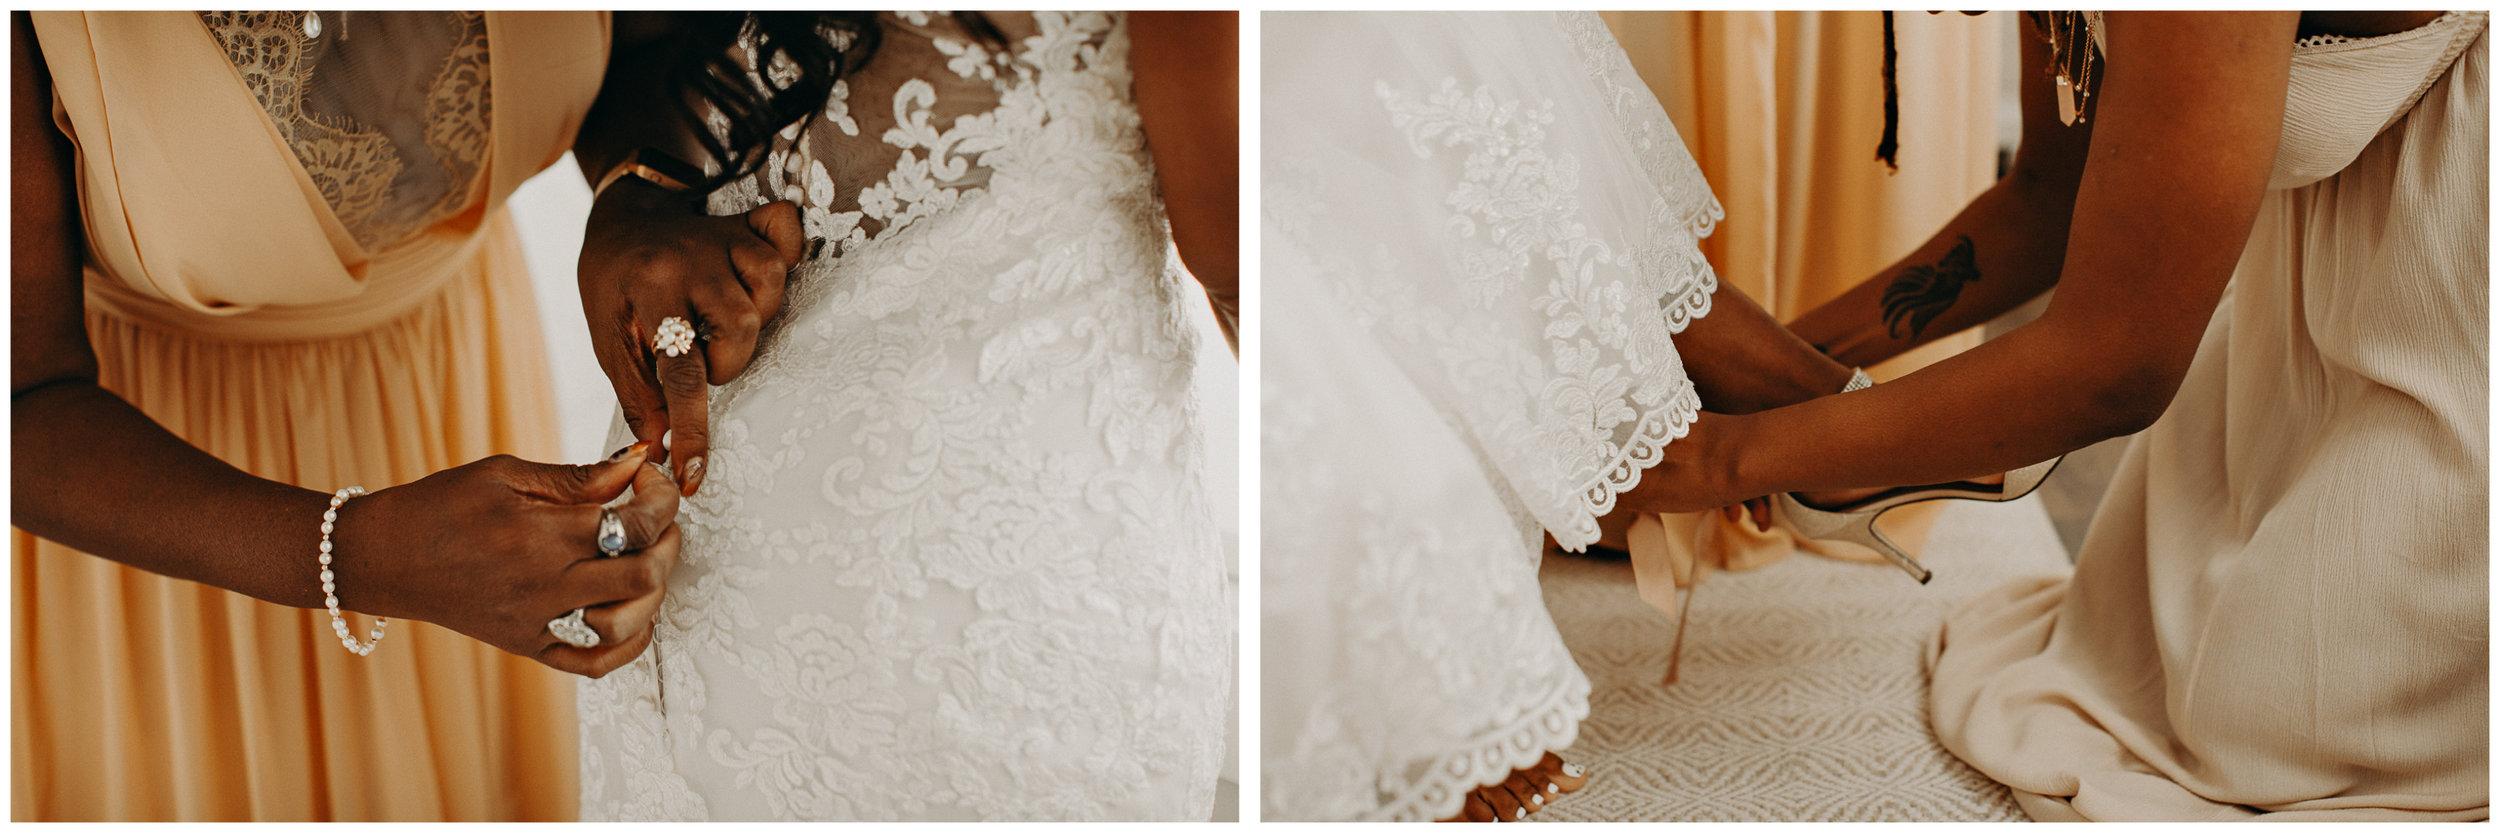 14- Wedding_day_atlanta_georgia_bride_details_dress_aline_marin_photography_-12.jpg